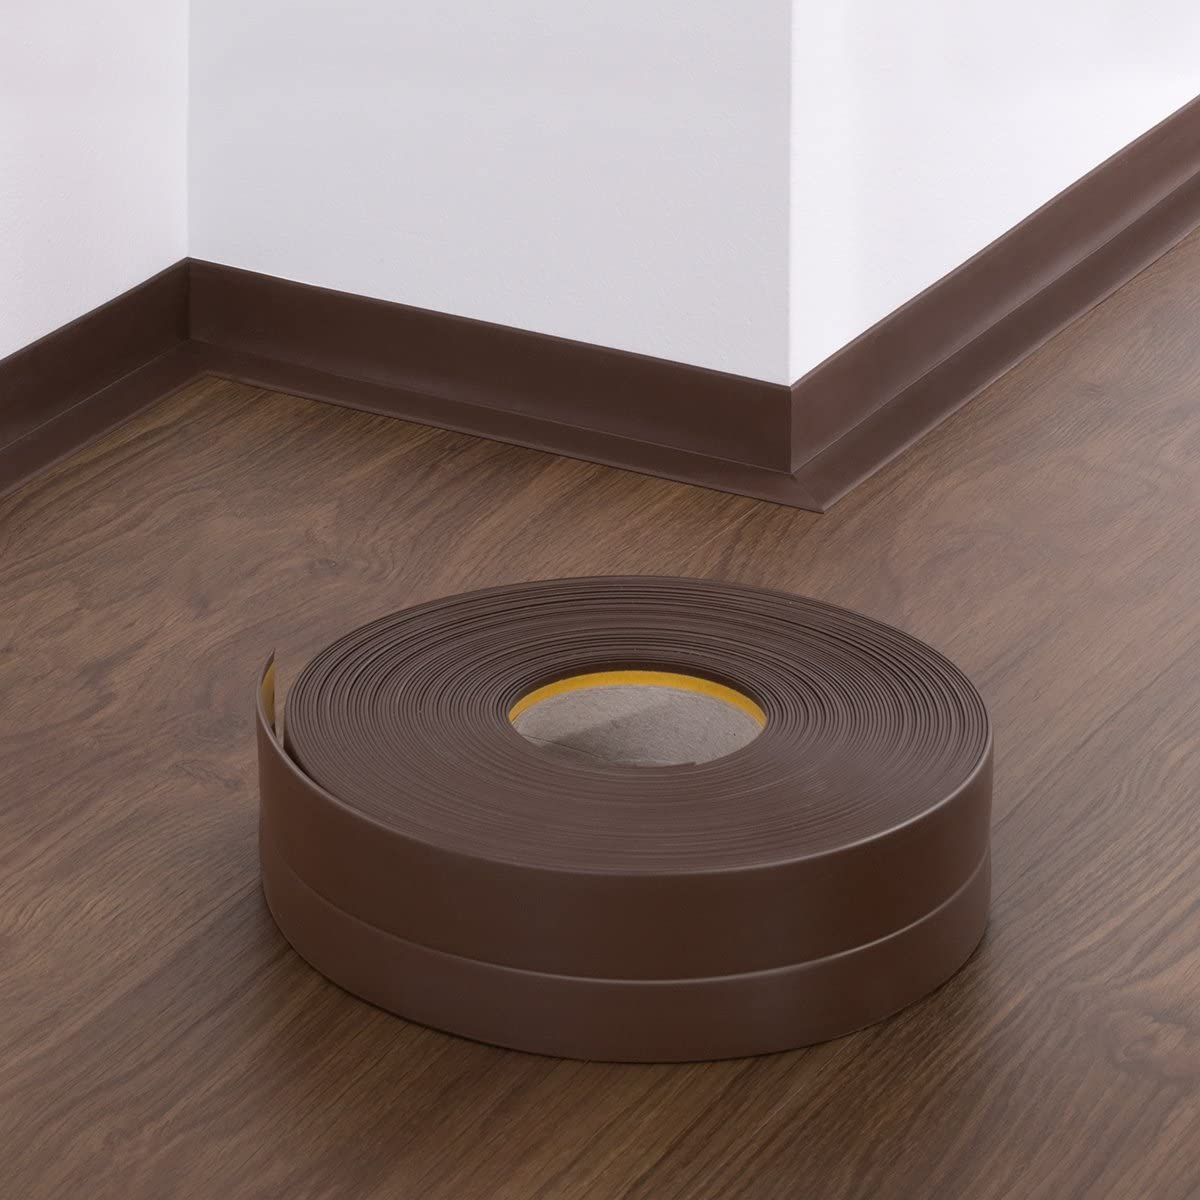 5 m HOLZBRINK Plinthe Souple Autoadh/ésive Chocolat Plinthe pliable 32x23 mm